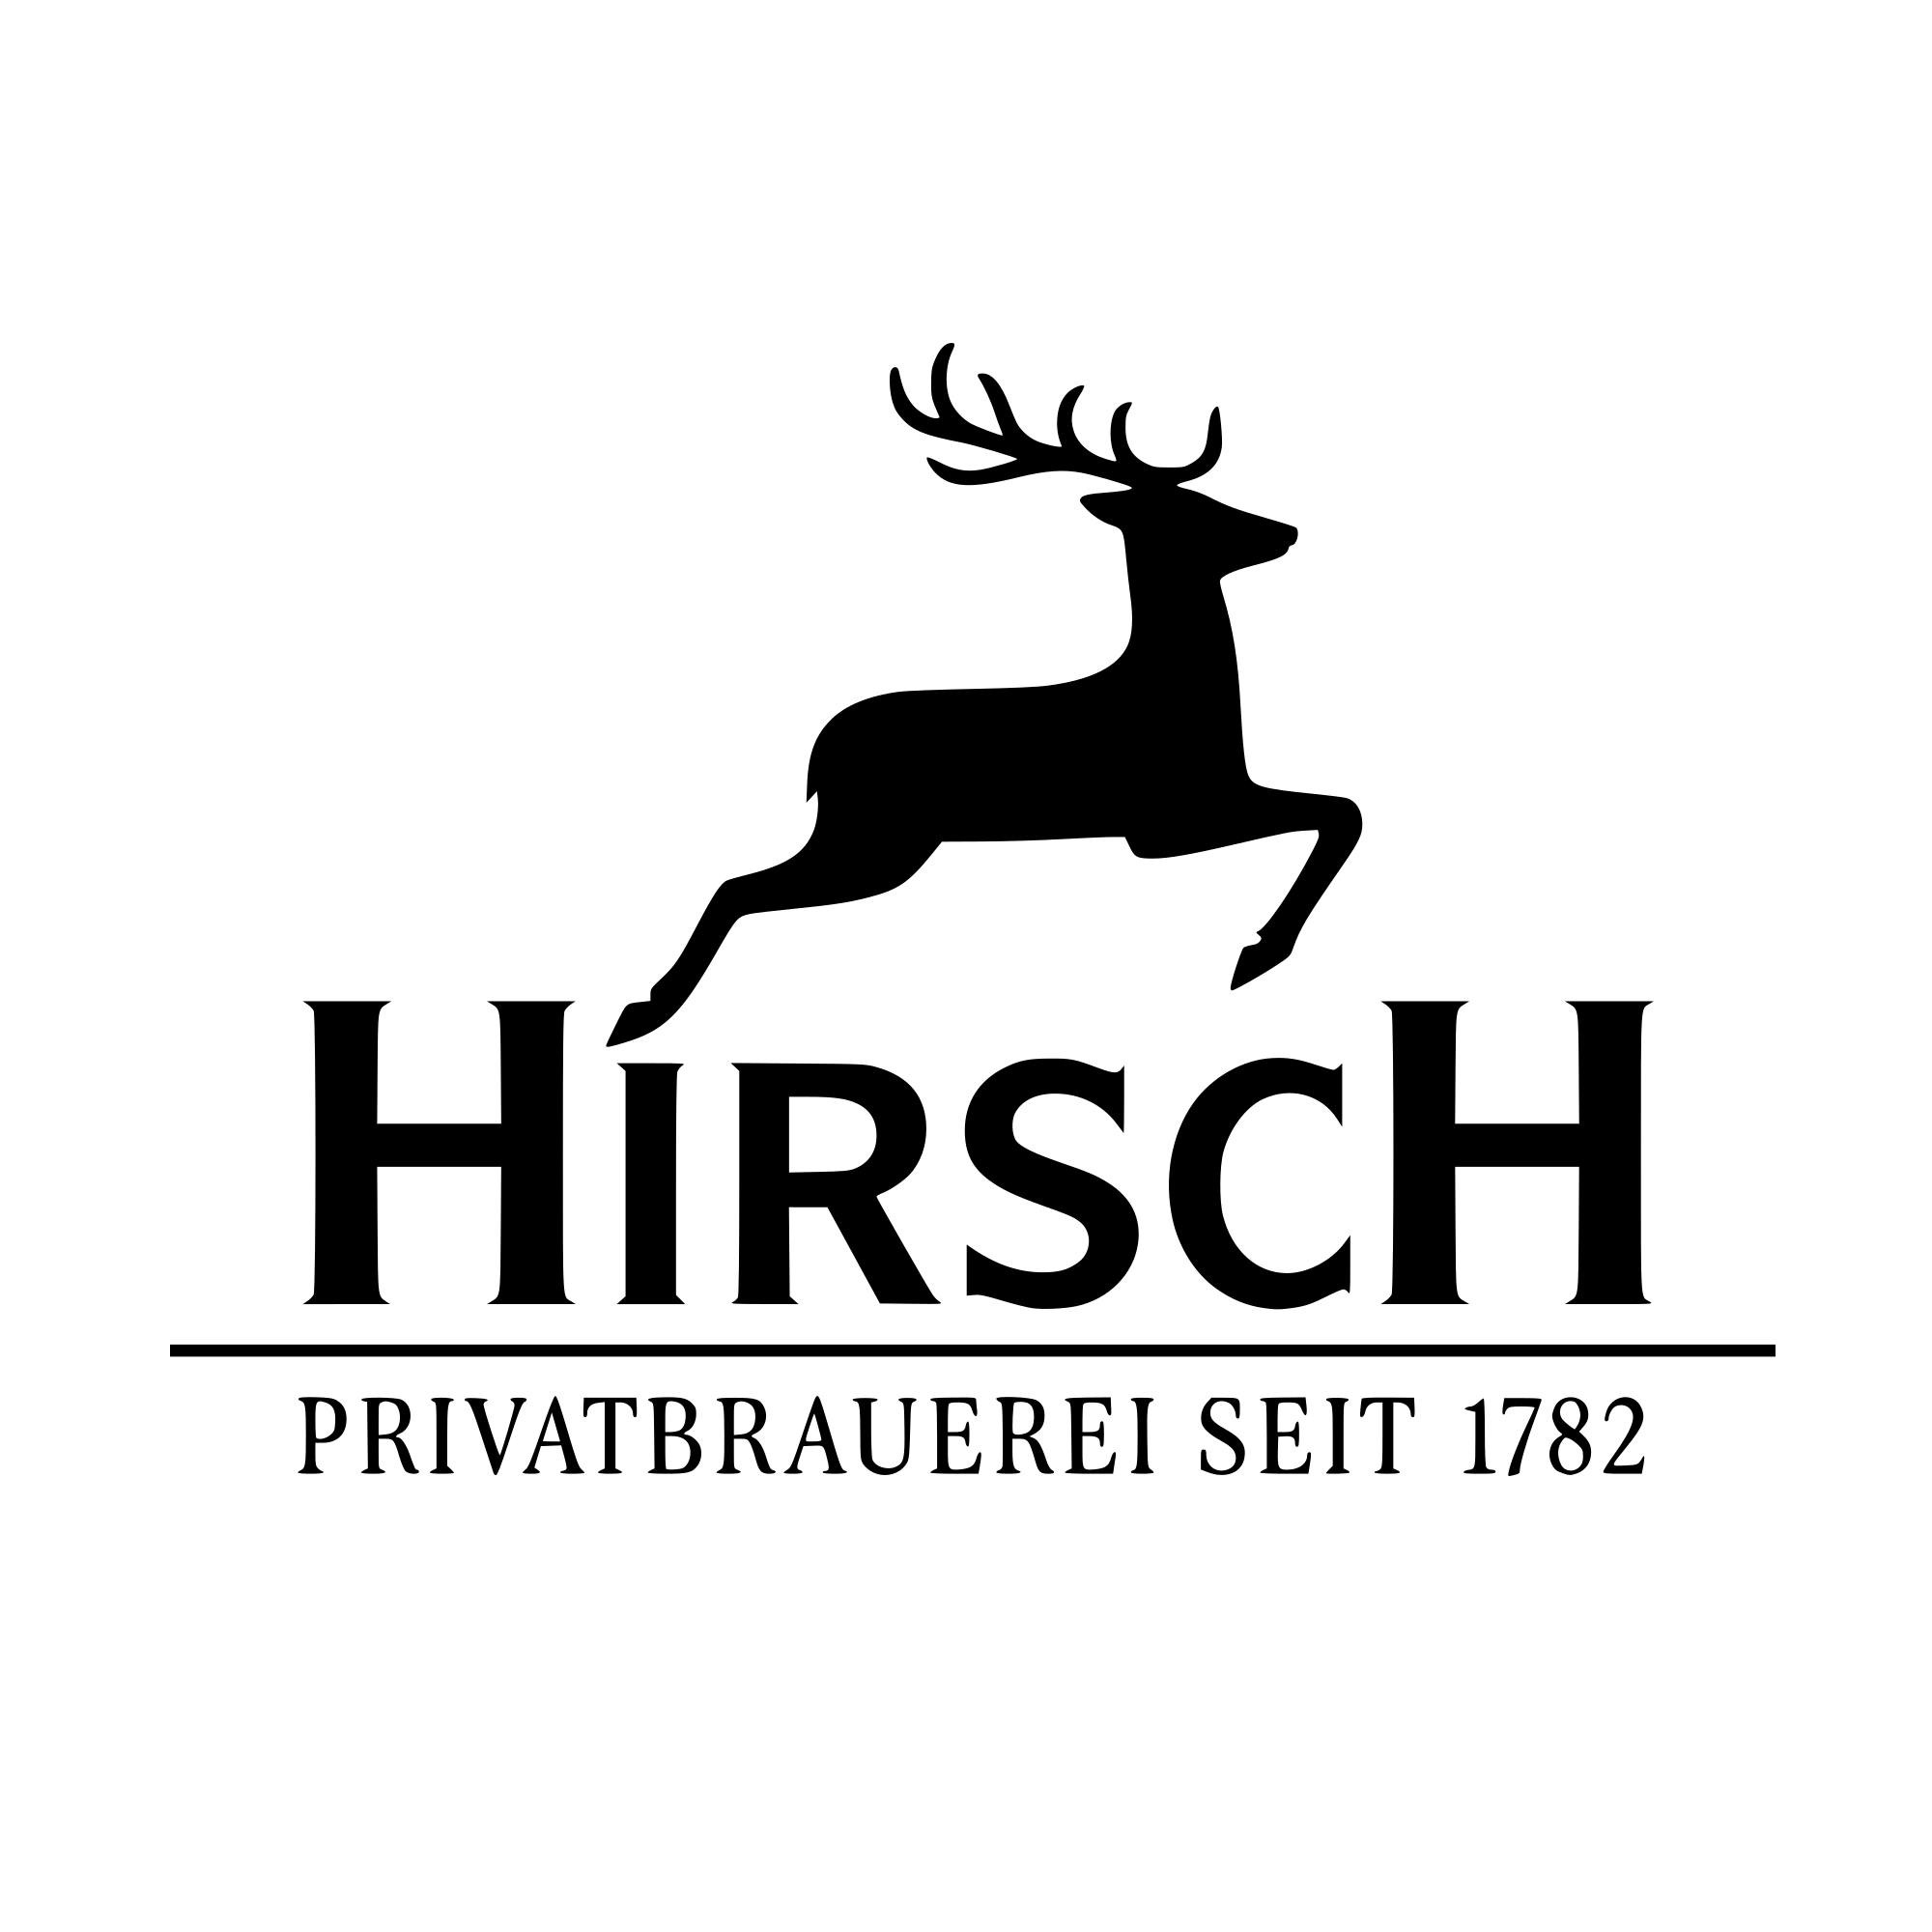 Hirsch_2000-2000